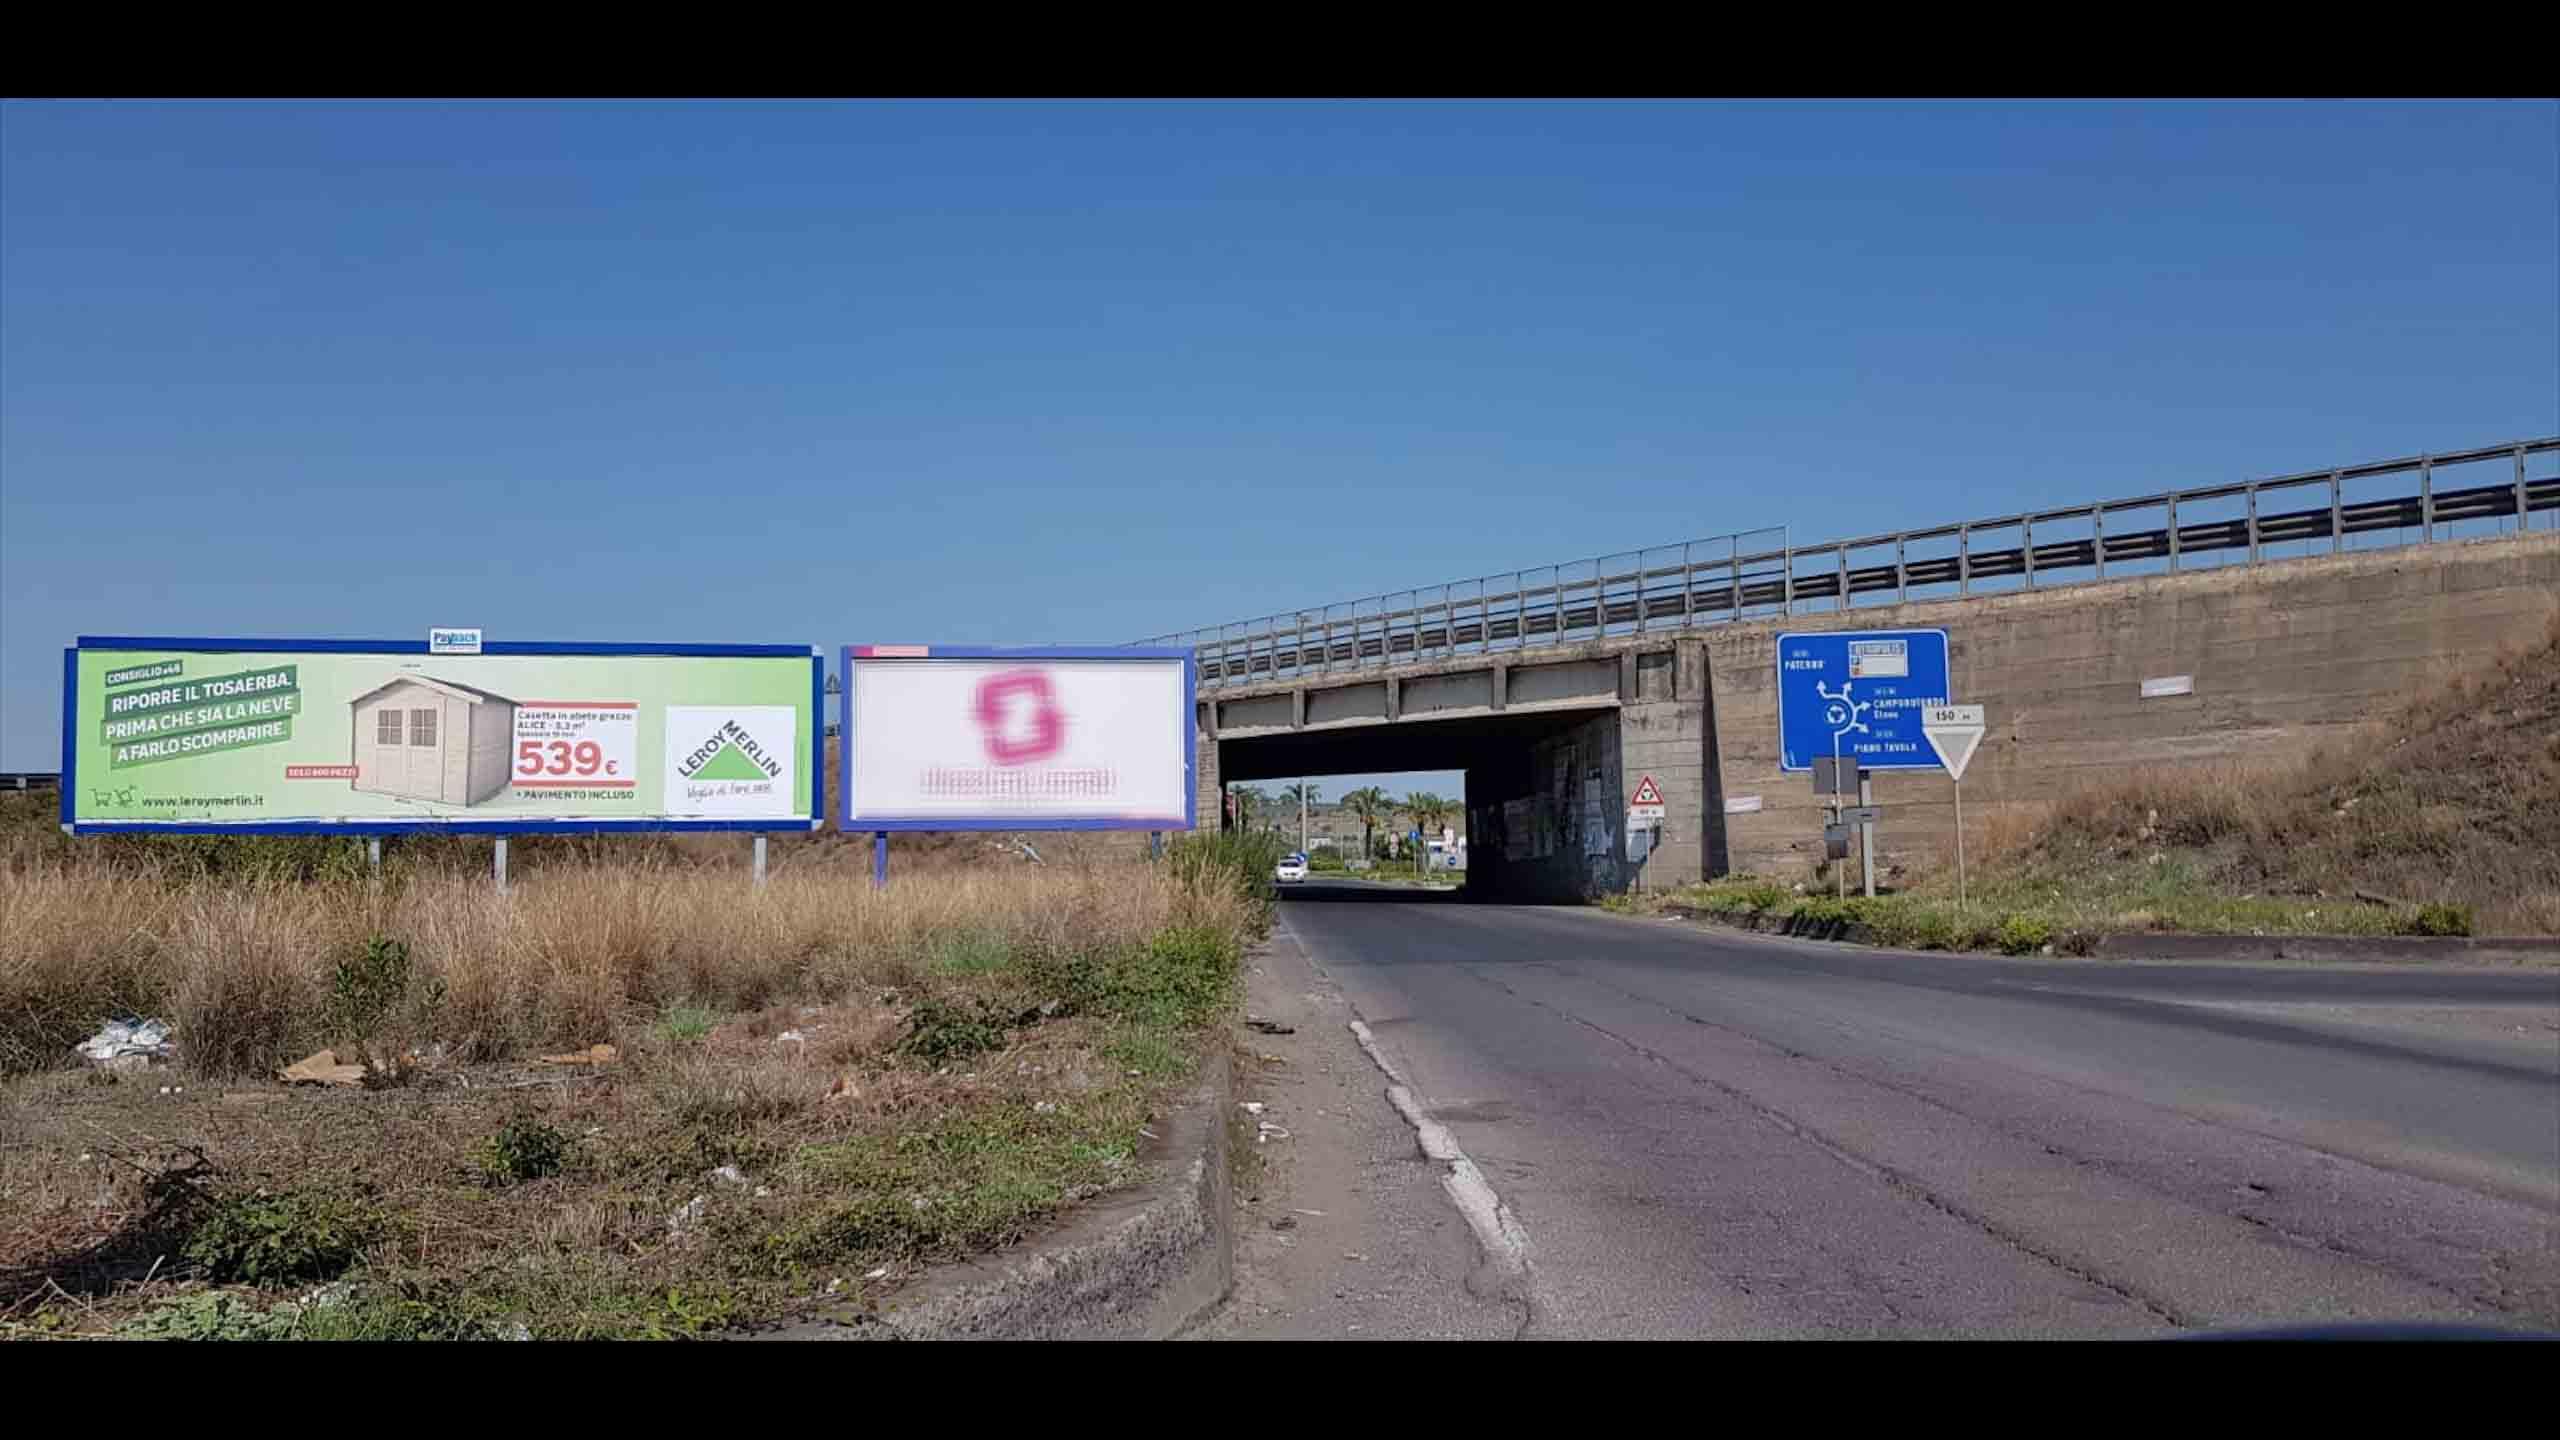 Uscita-Valcorrente-direzione-Centro-Commerciale-Etnapolis-Cartellone-pubblicitario-12x3-mt-Belpasso